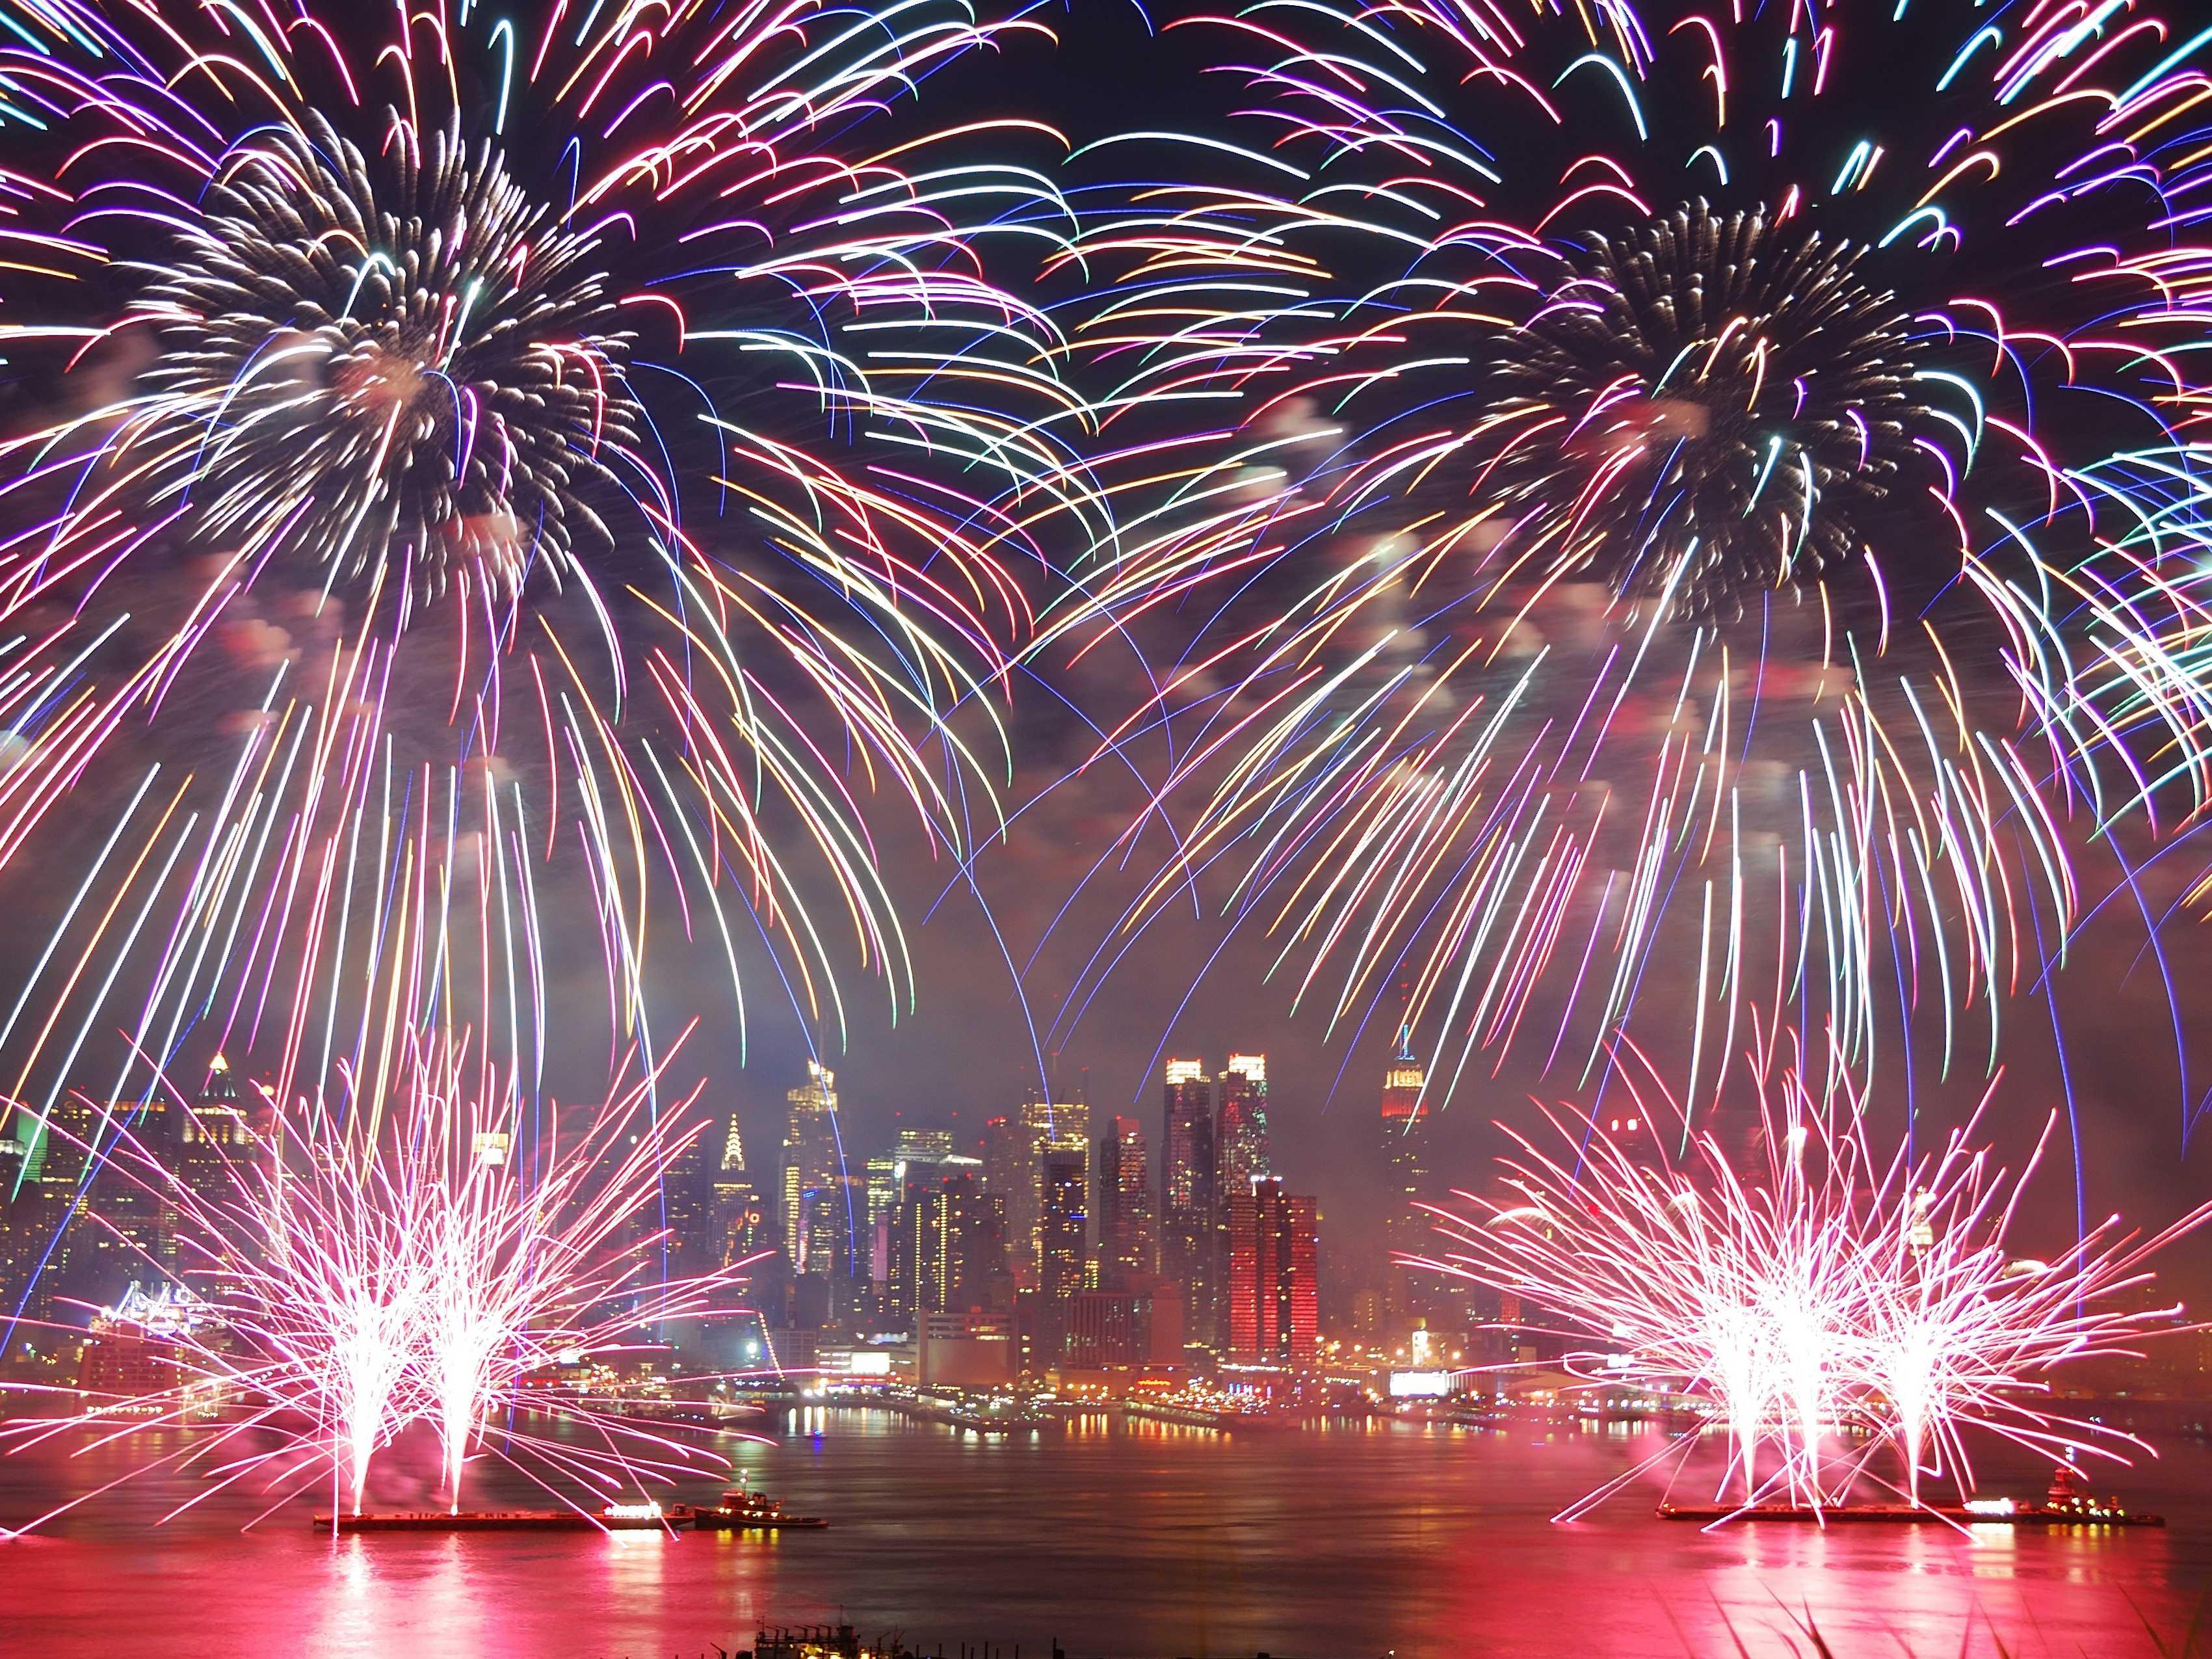 4th Of July Ipad Wallpaper Hd: 4th Of July Fireworks Wallpaper